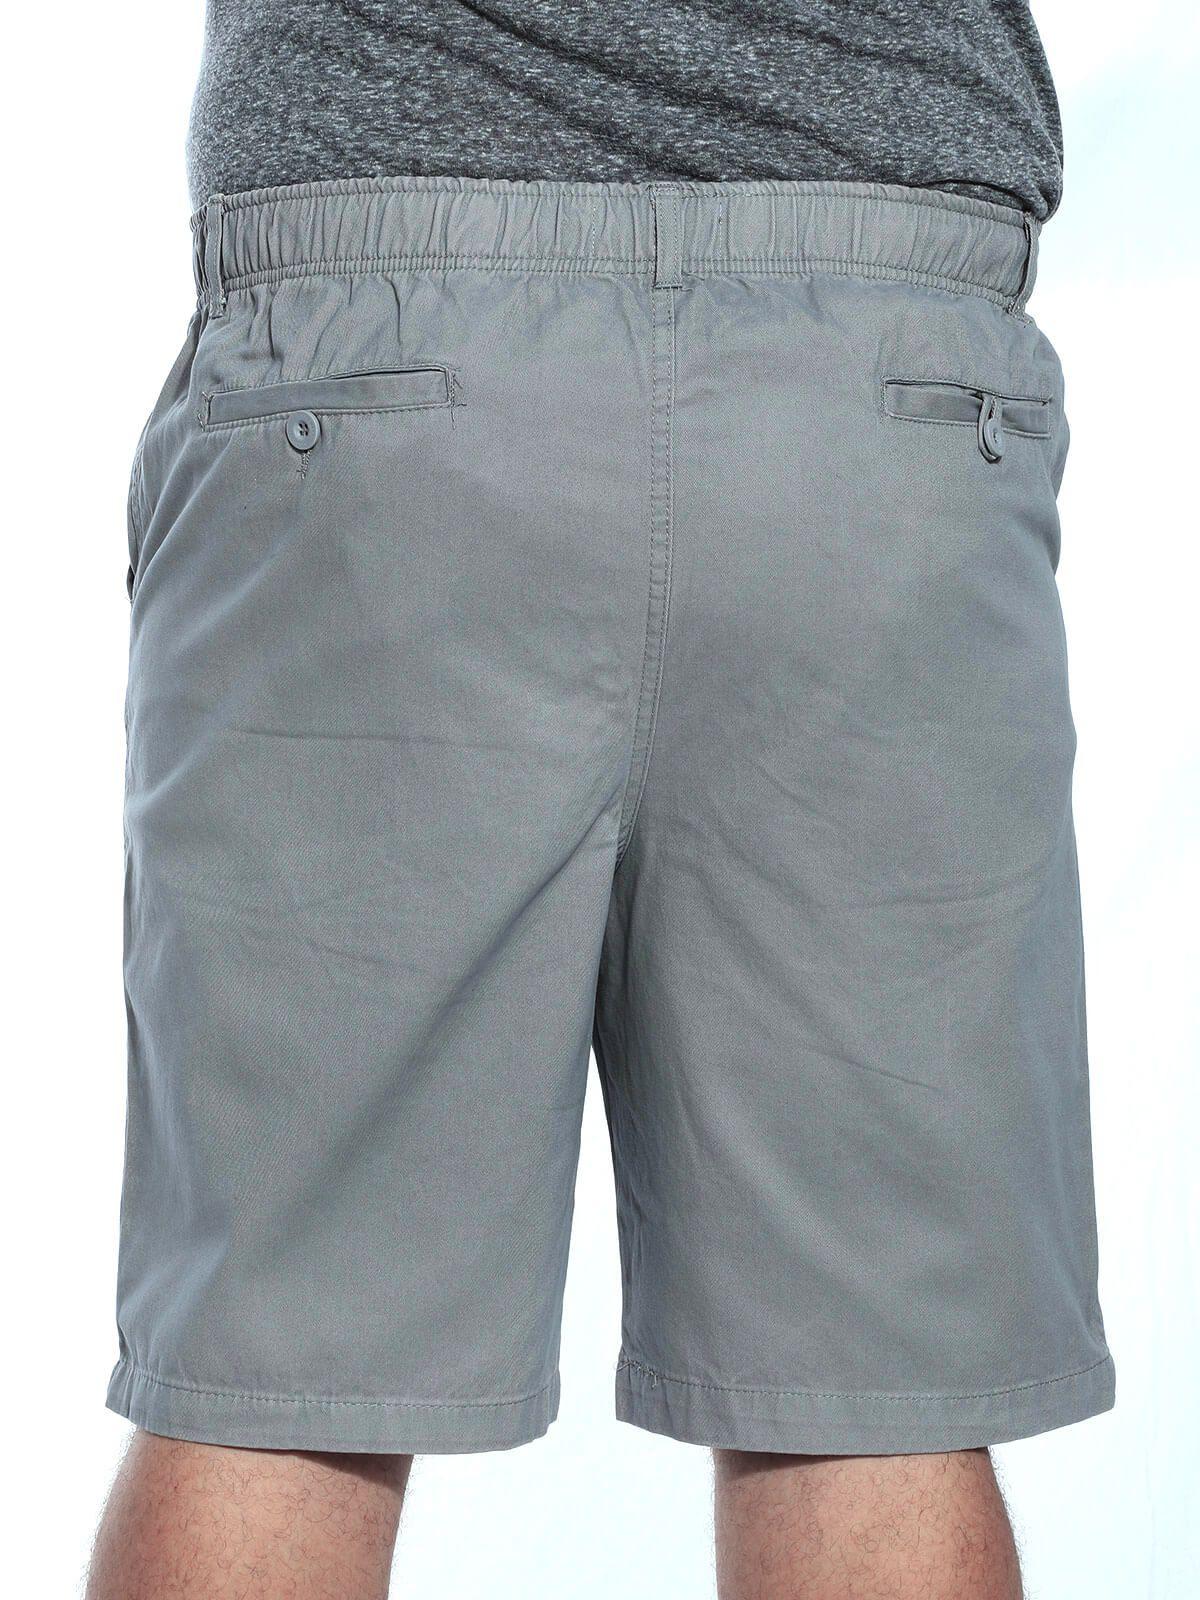 Bermuda Plus Size Masculina Sarja Com Elástico Cinza